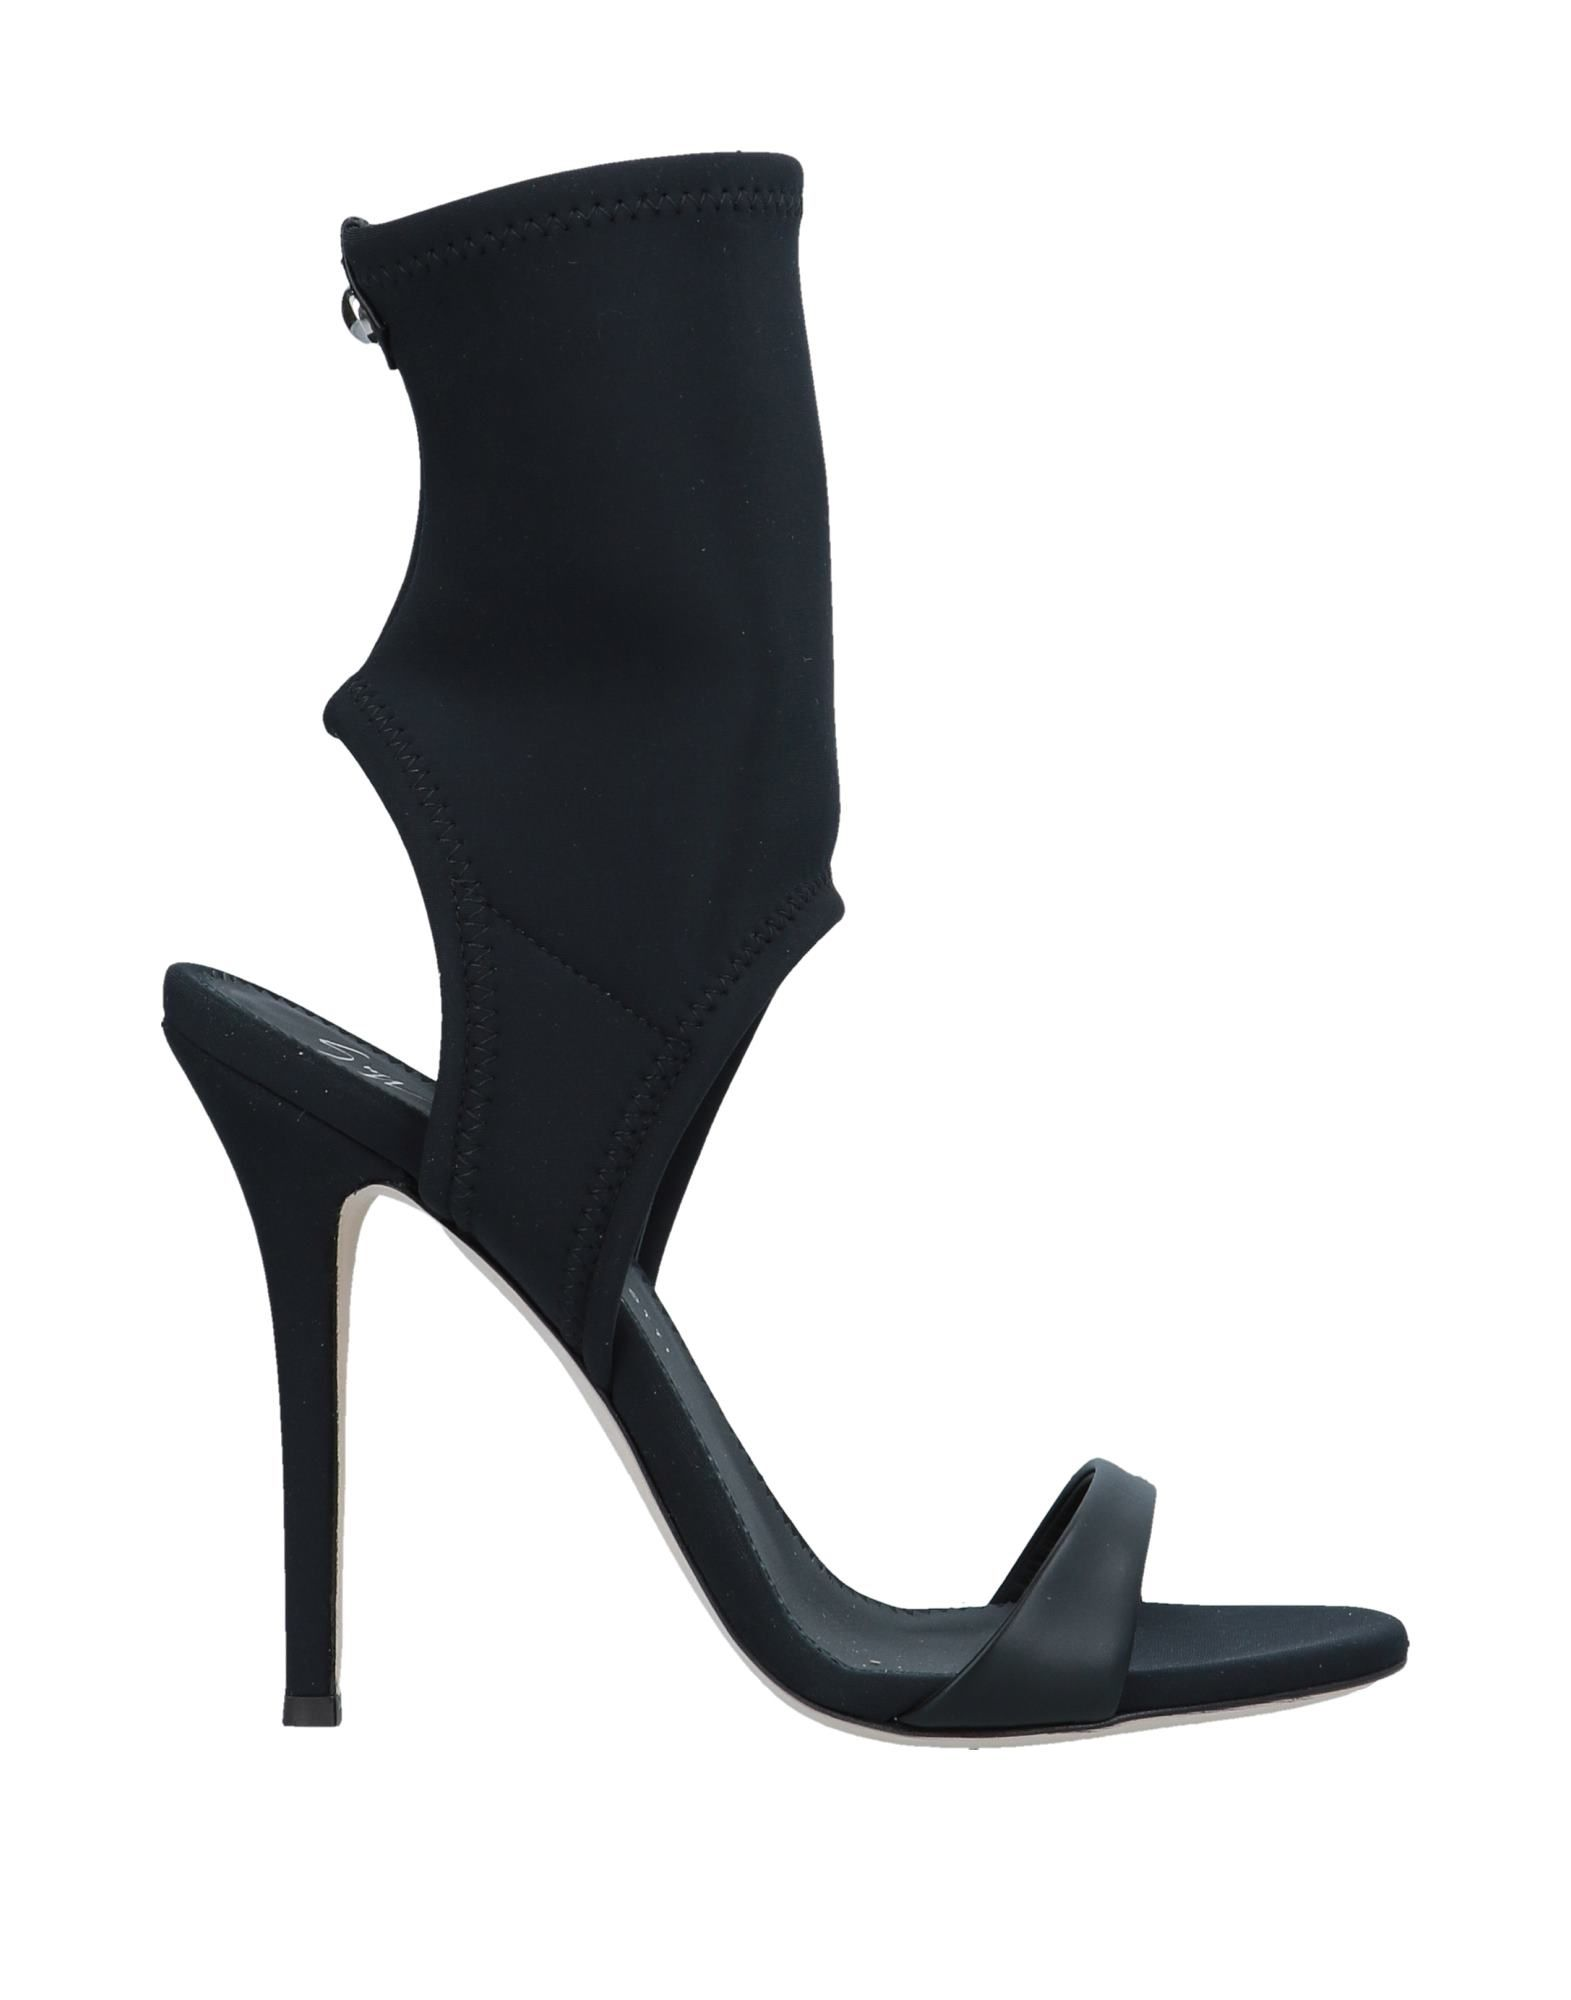 GIUSEPPE ZANOTTI Босоножки на каблуке цены онлайн